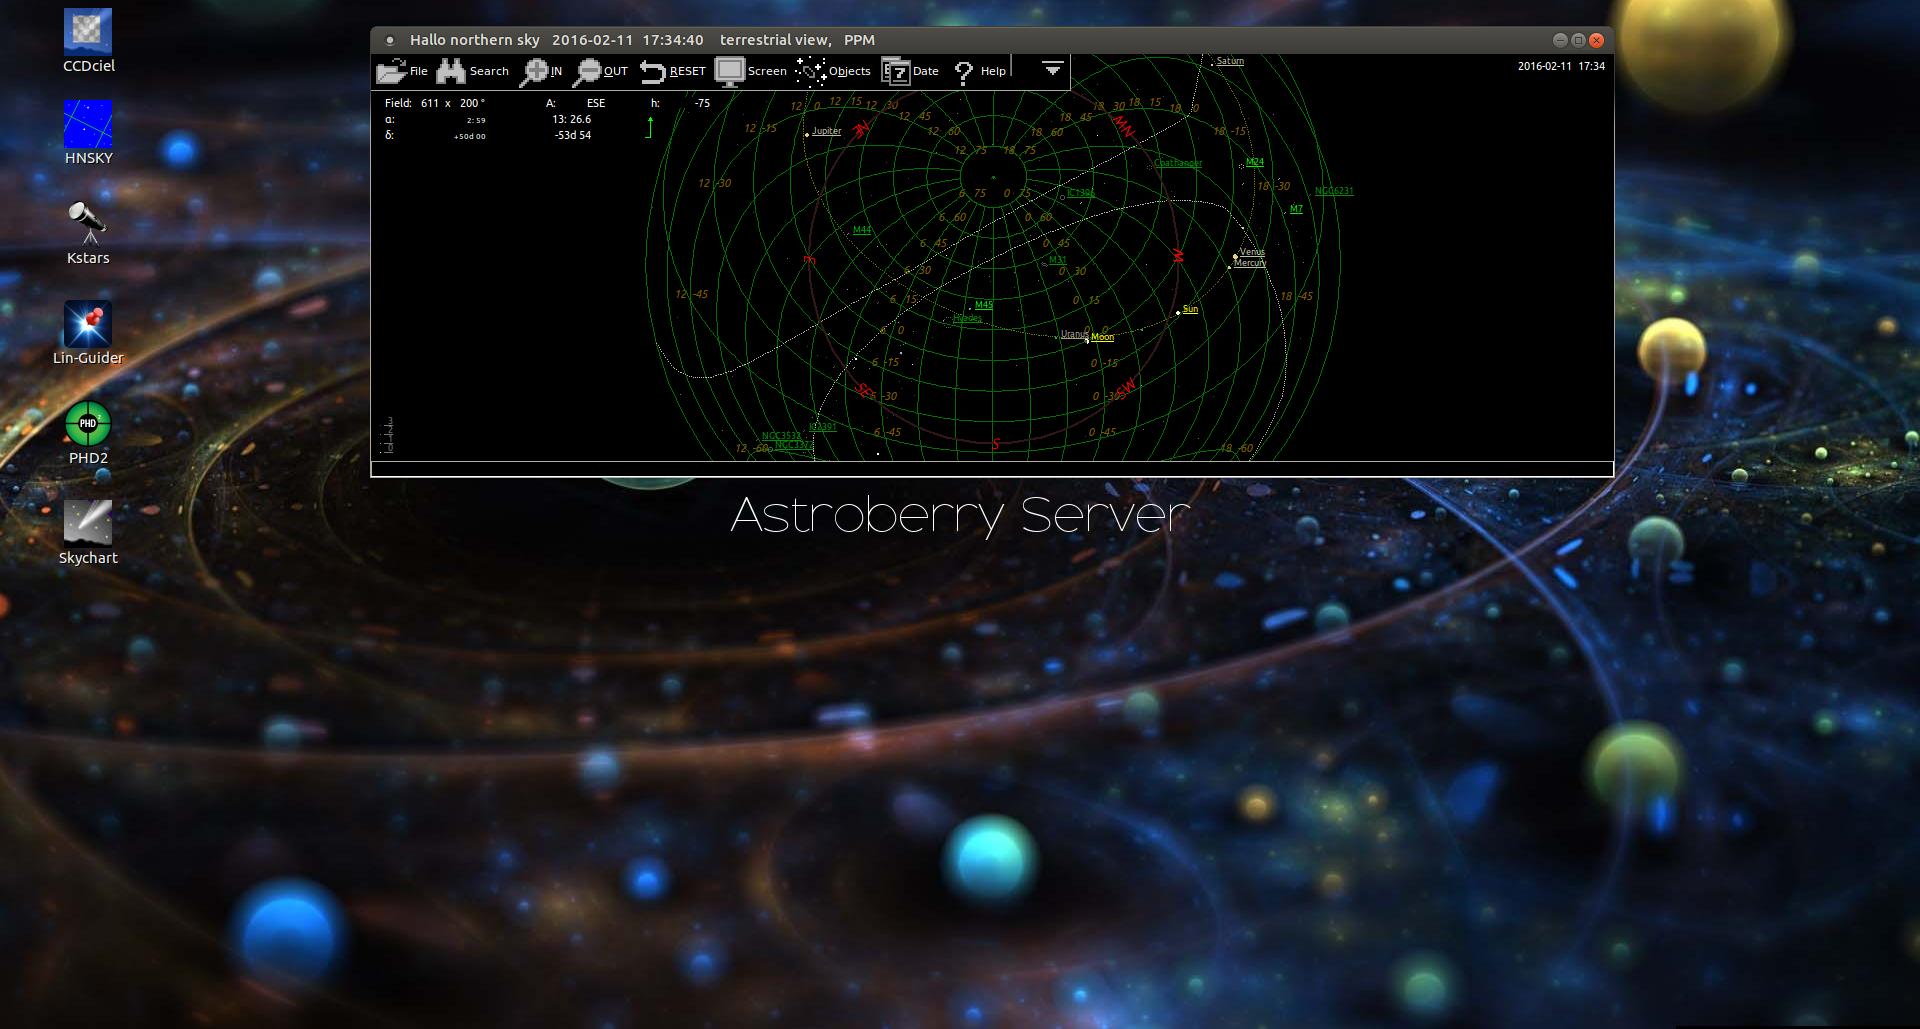 astroberry-server_1.1.0